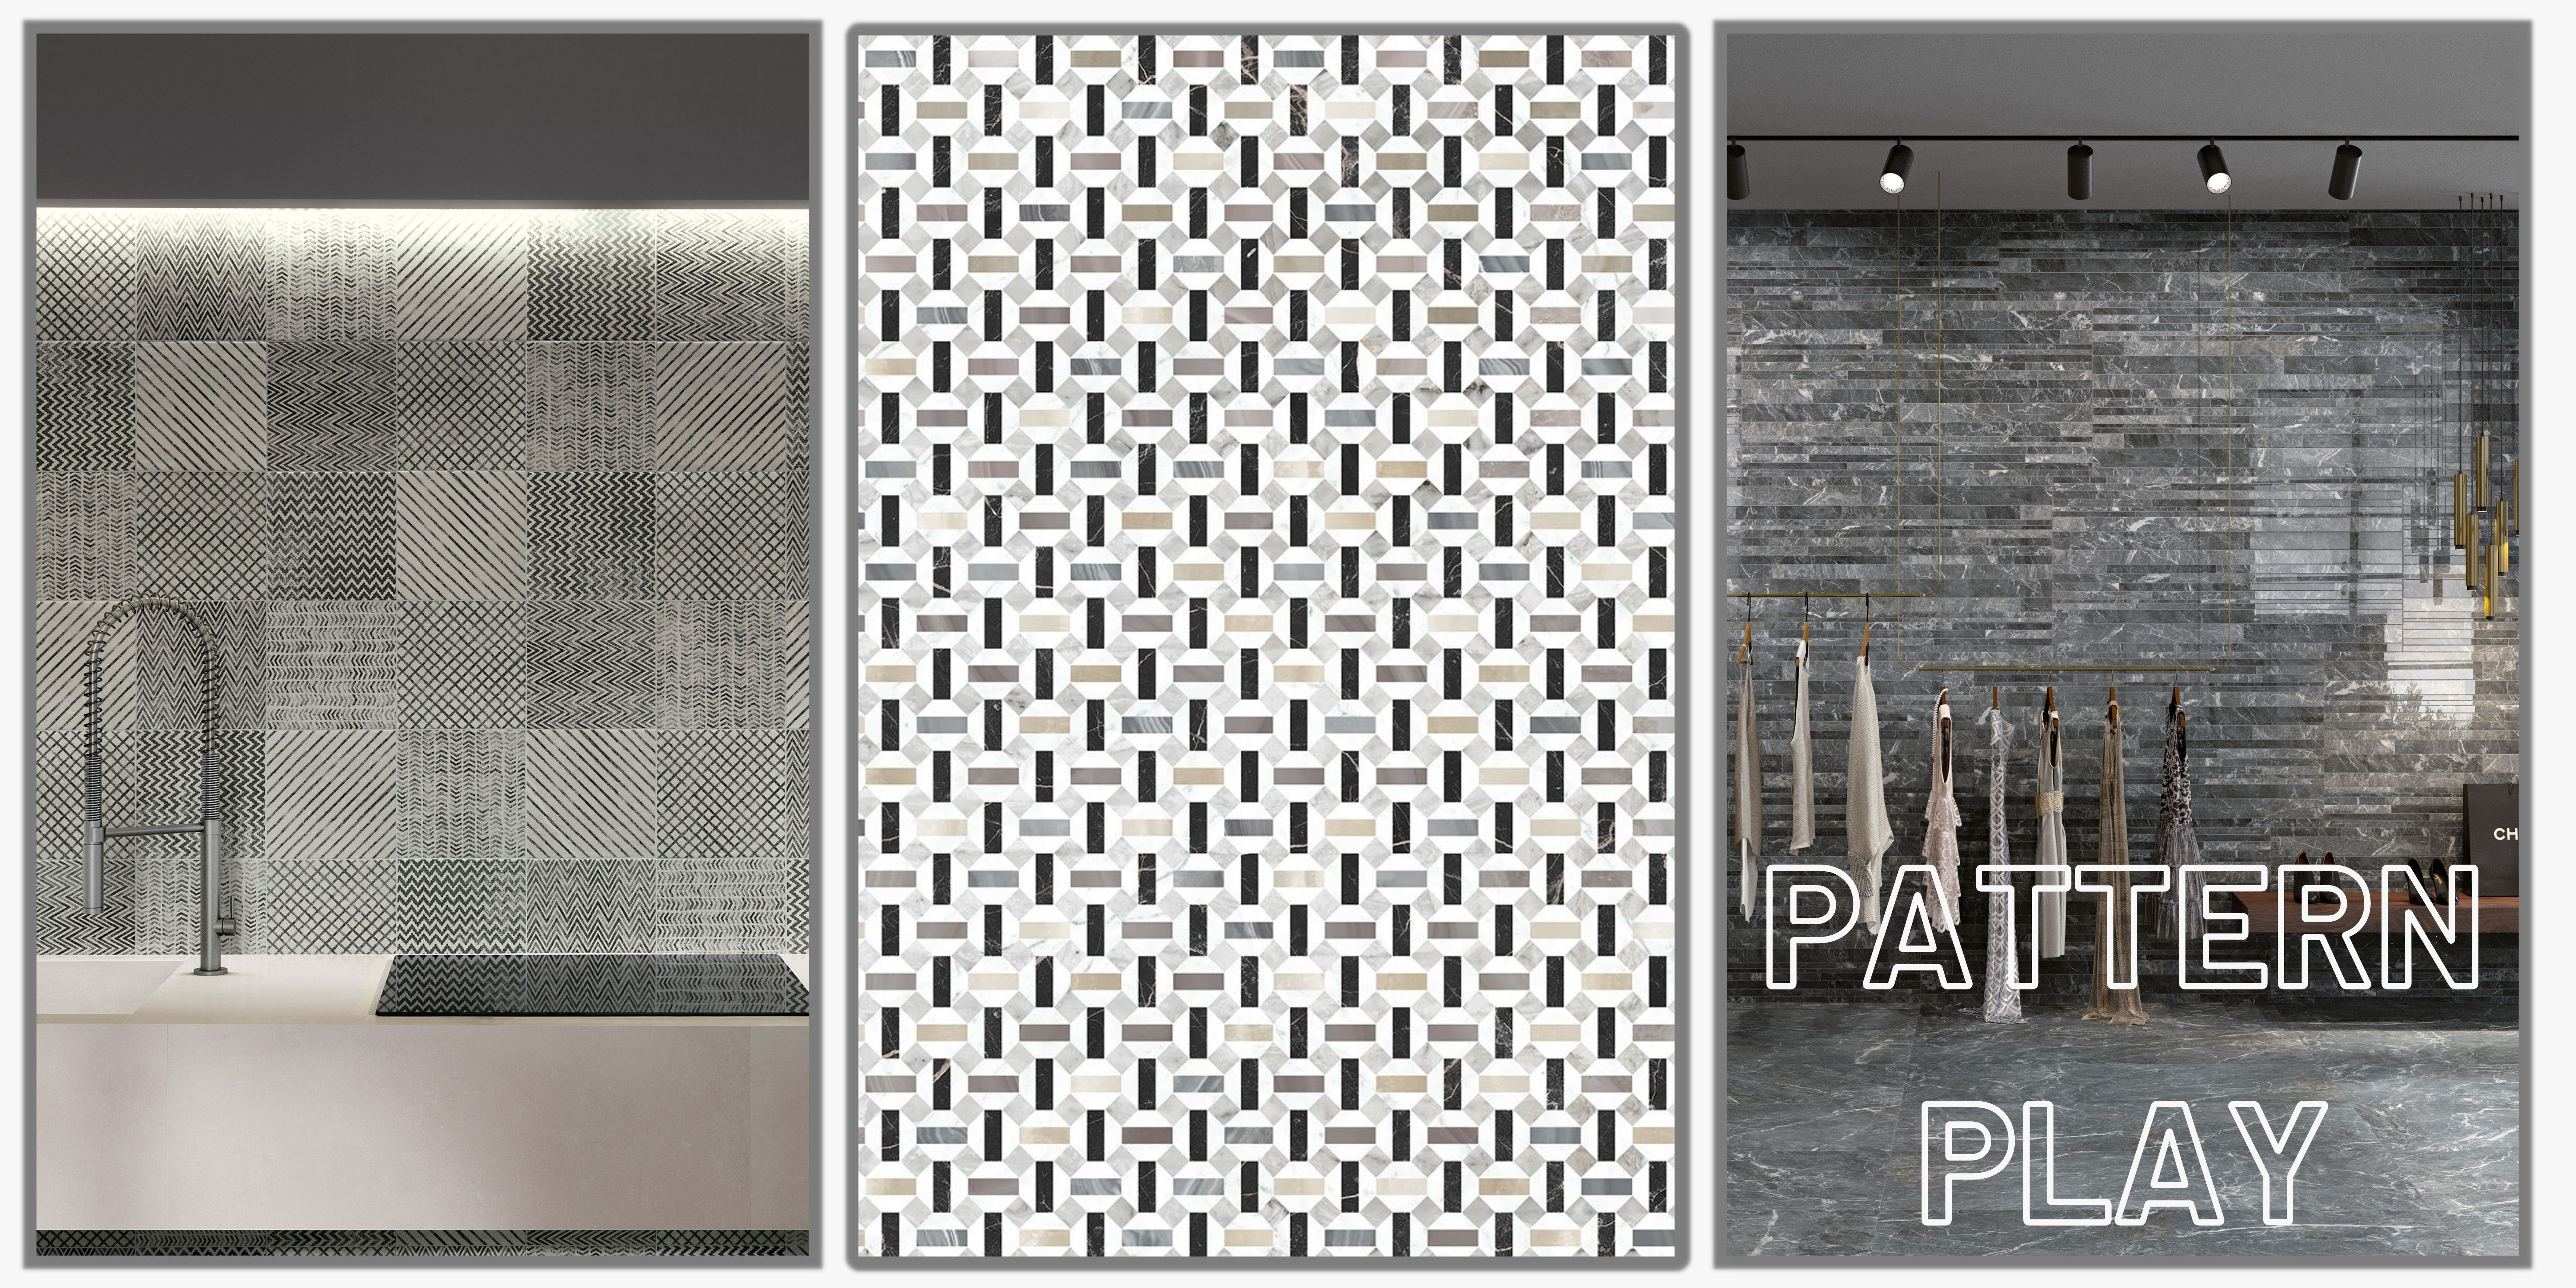 pattern-play.jpg